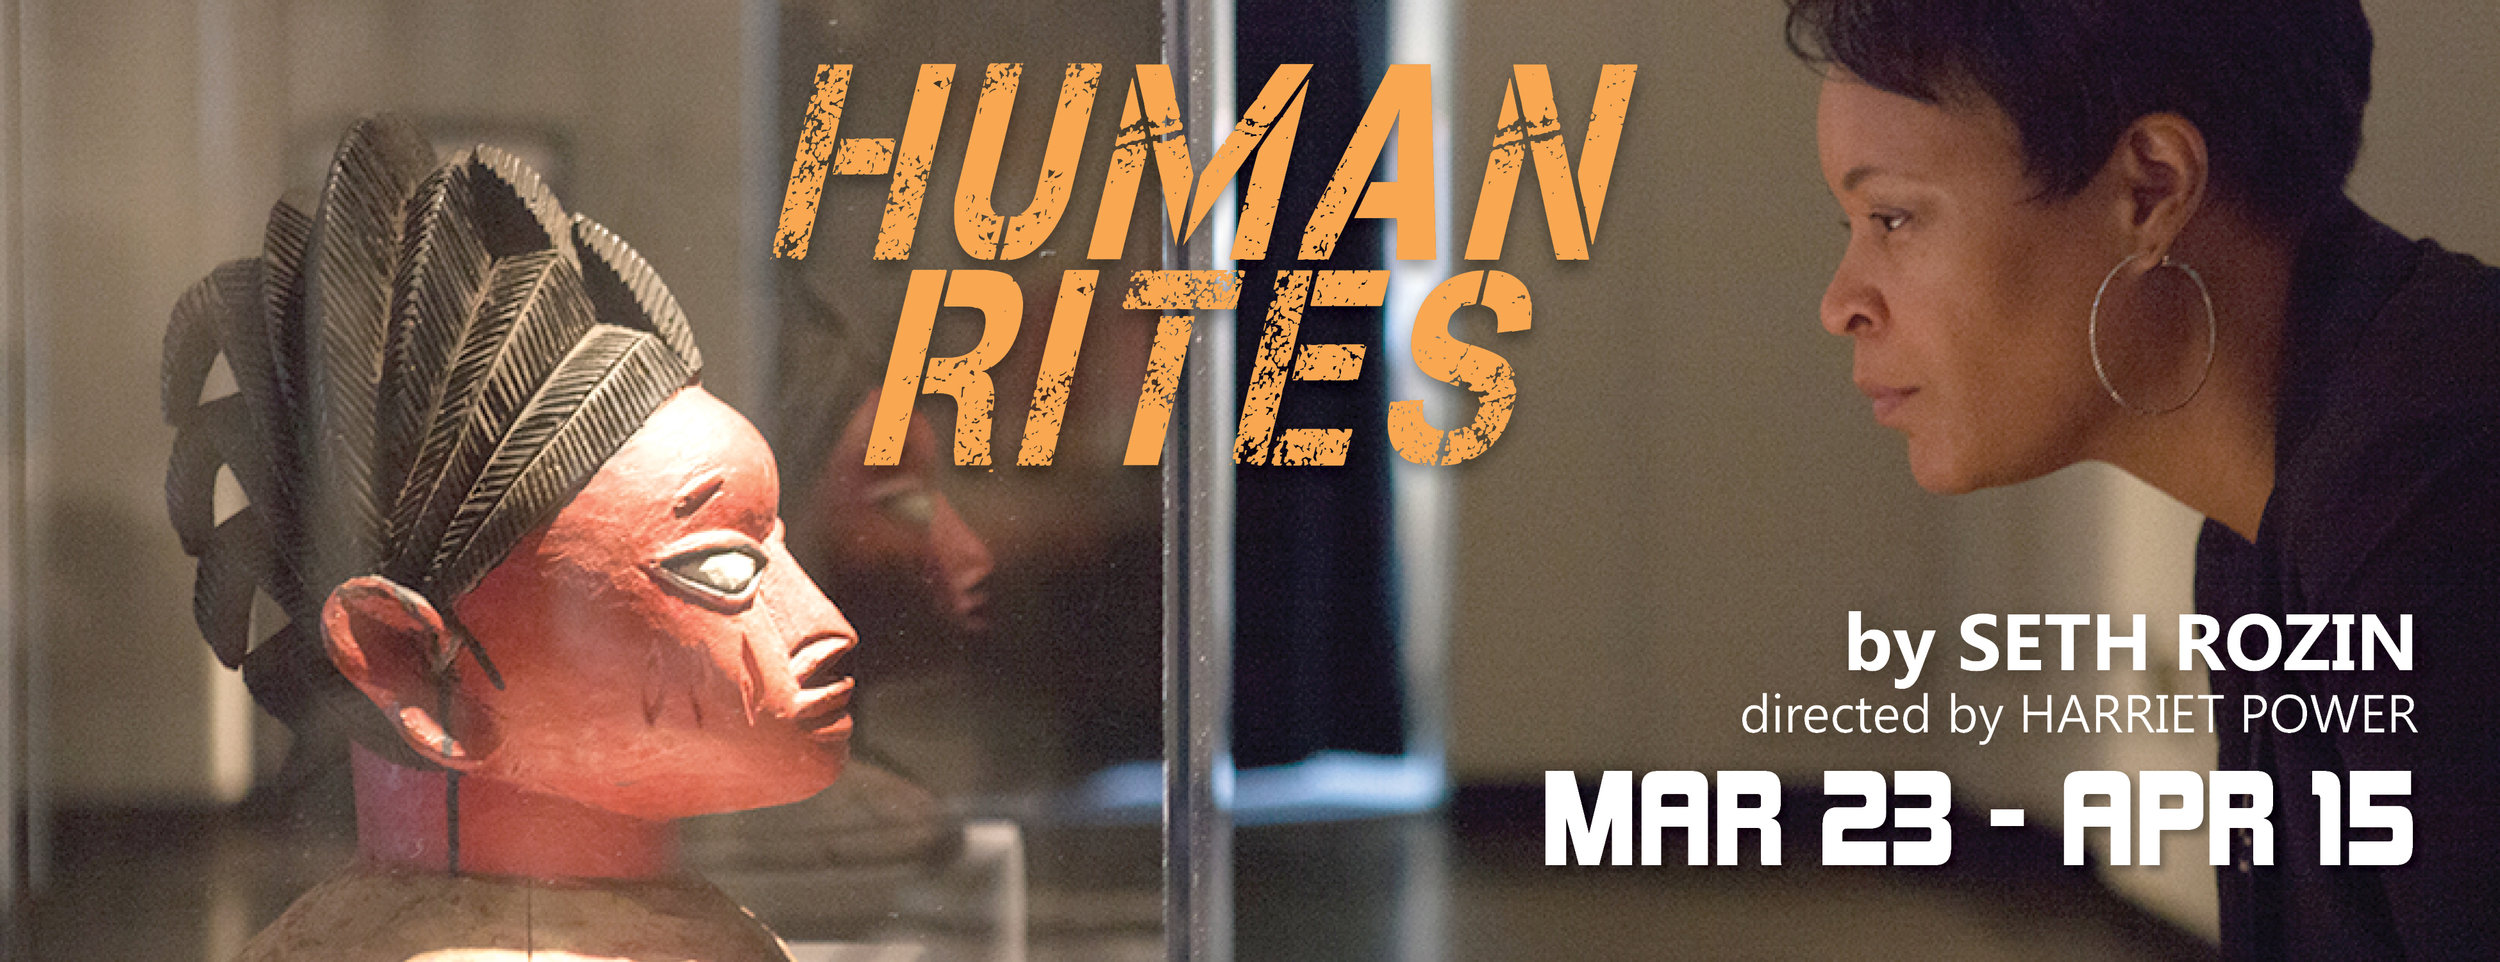 HUMAN RITES by Seth Rozin March 23 - April 15